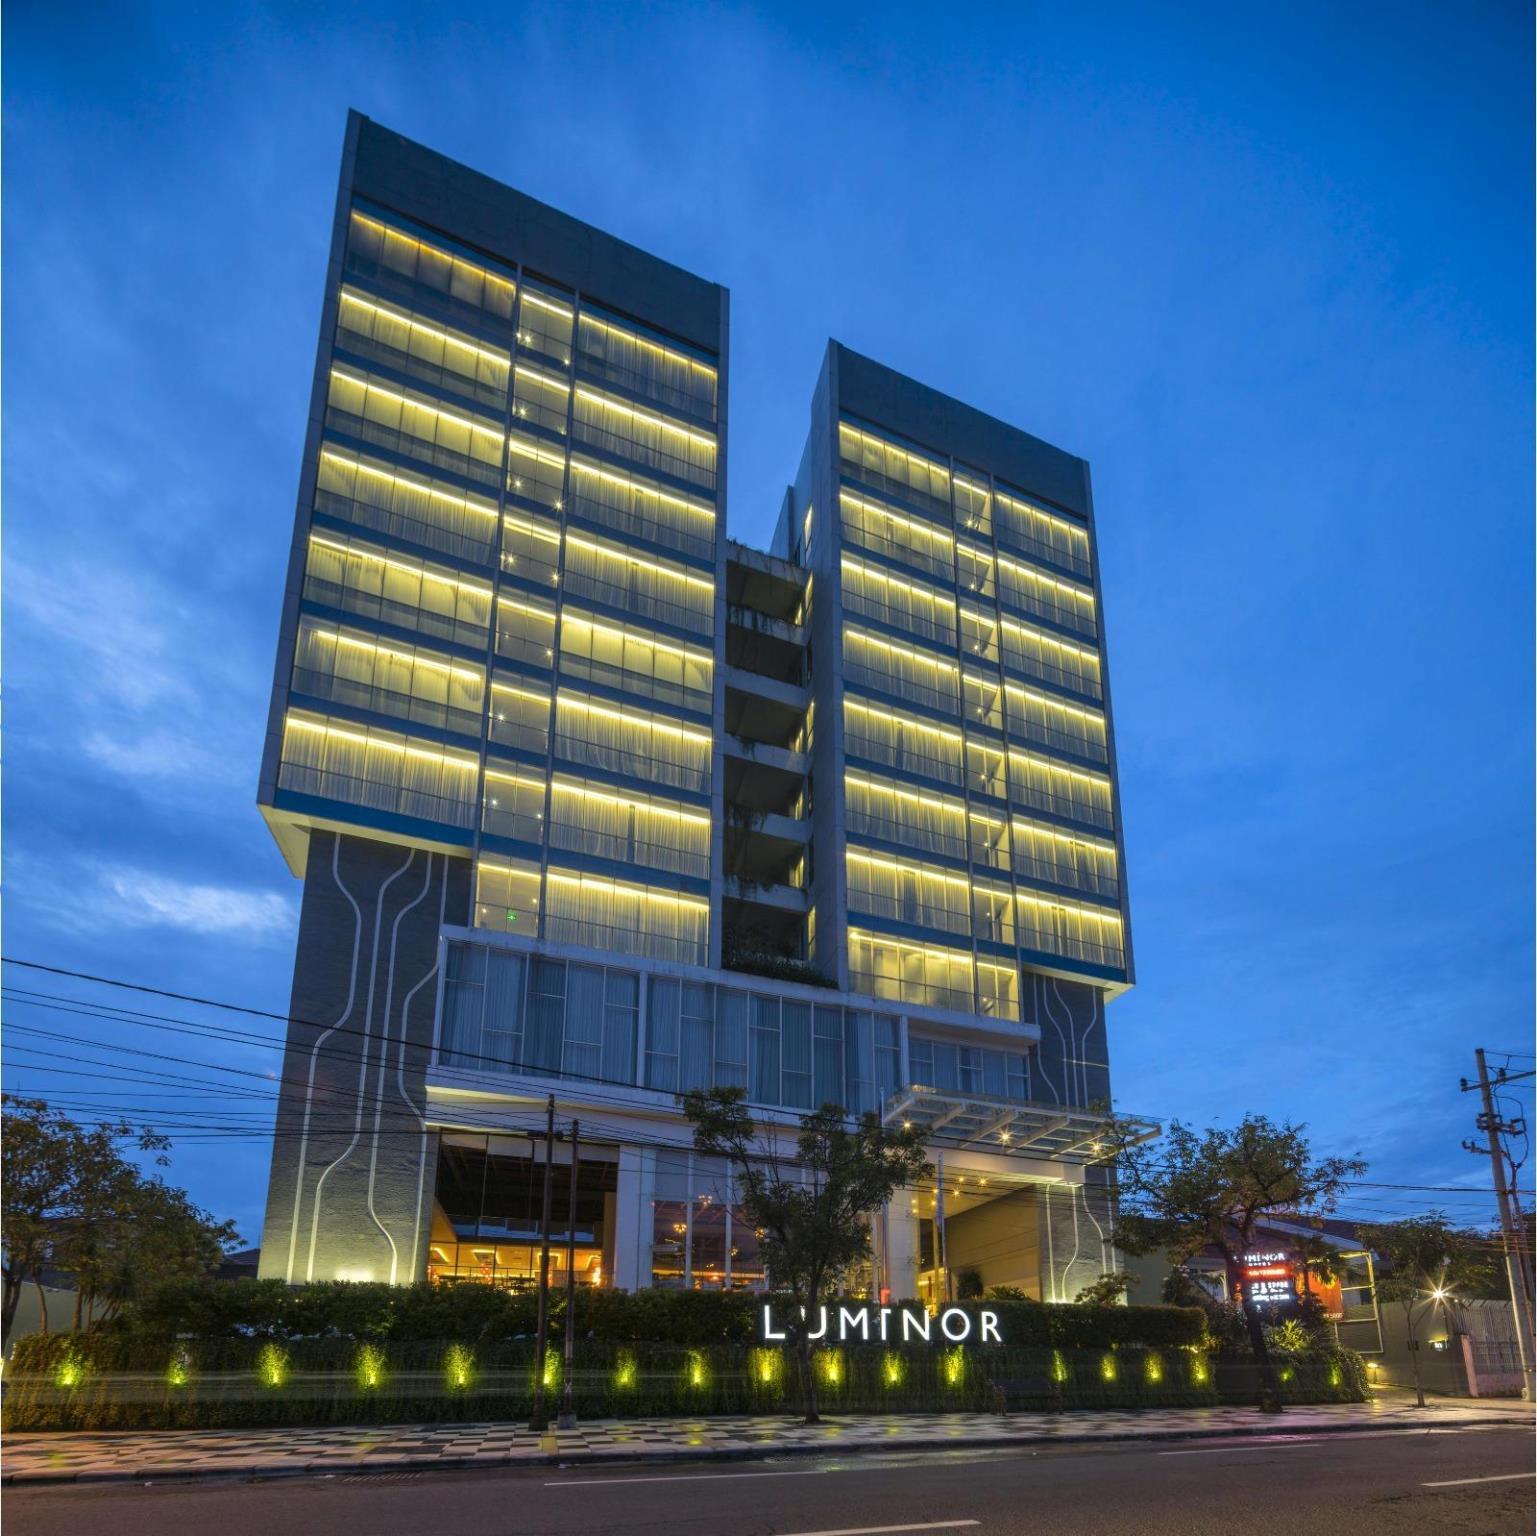 Luminor Hotel